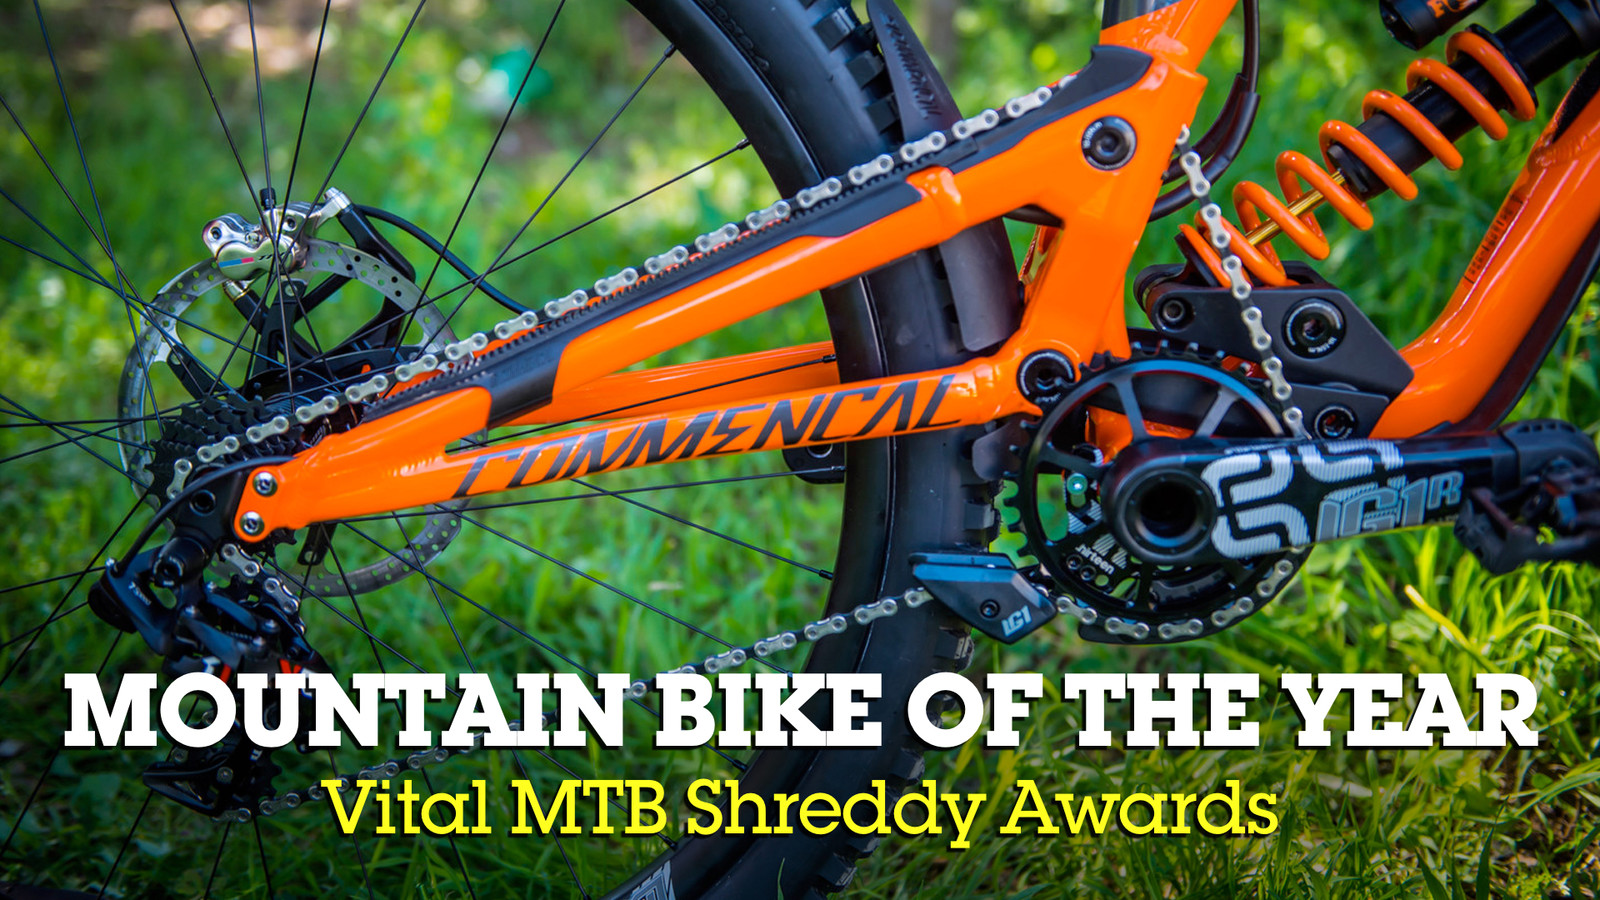 Mountain Bike of the Year - Shreddy Awards